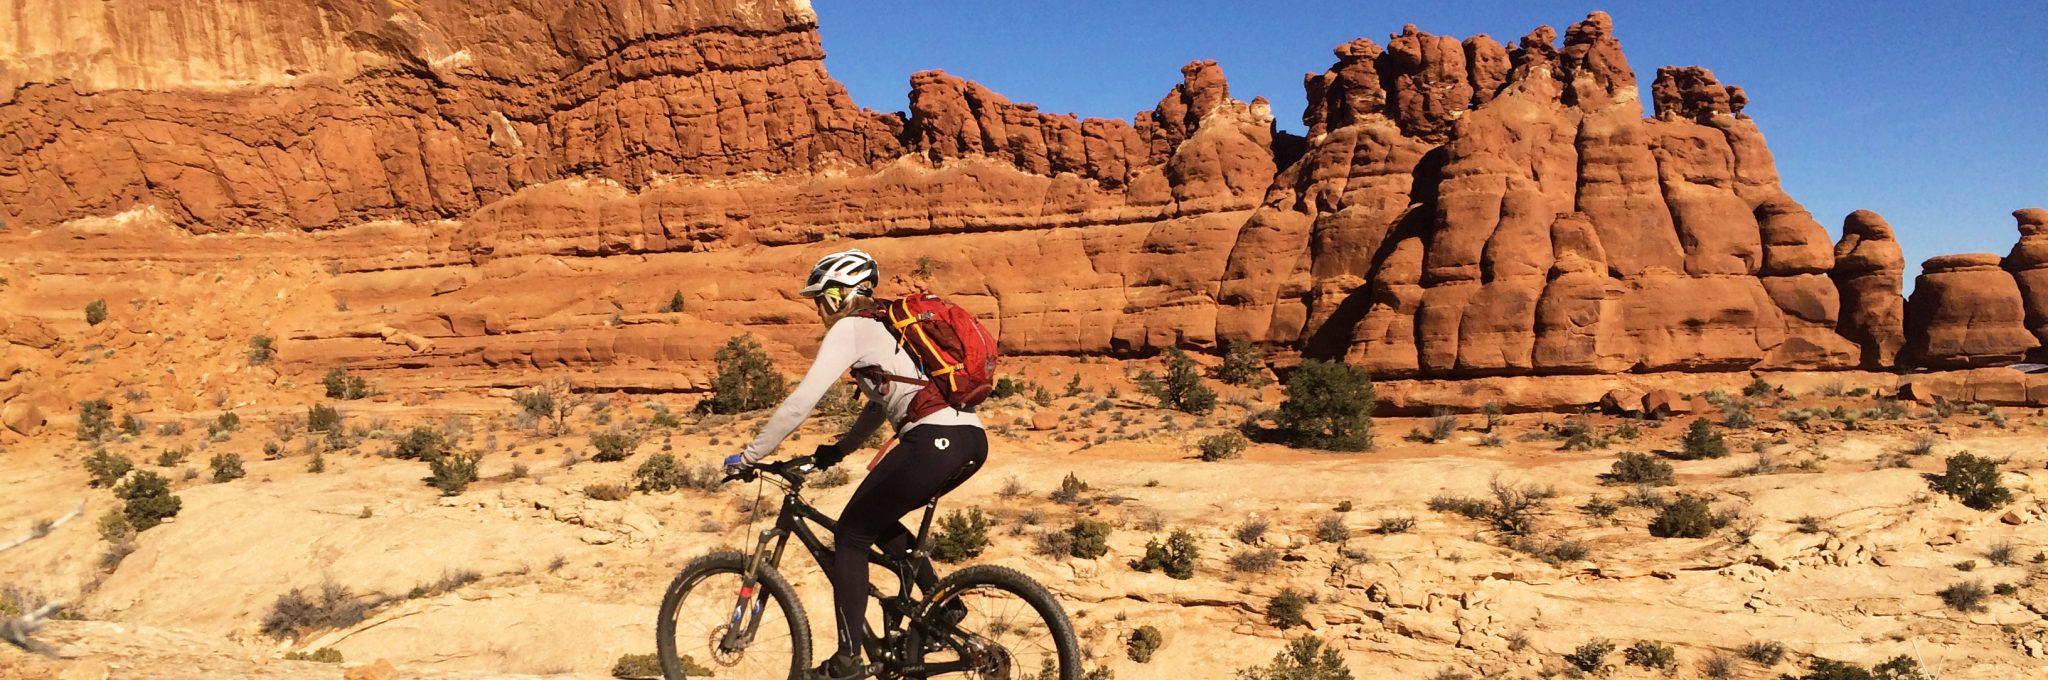 Big Mesa Loop, Navajo Rocks